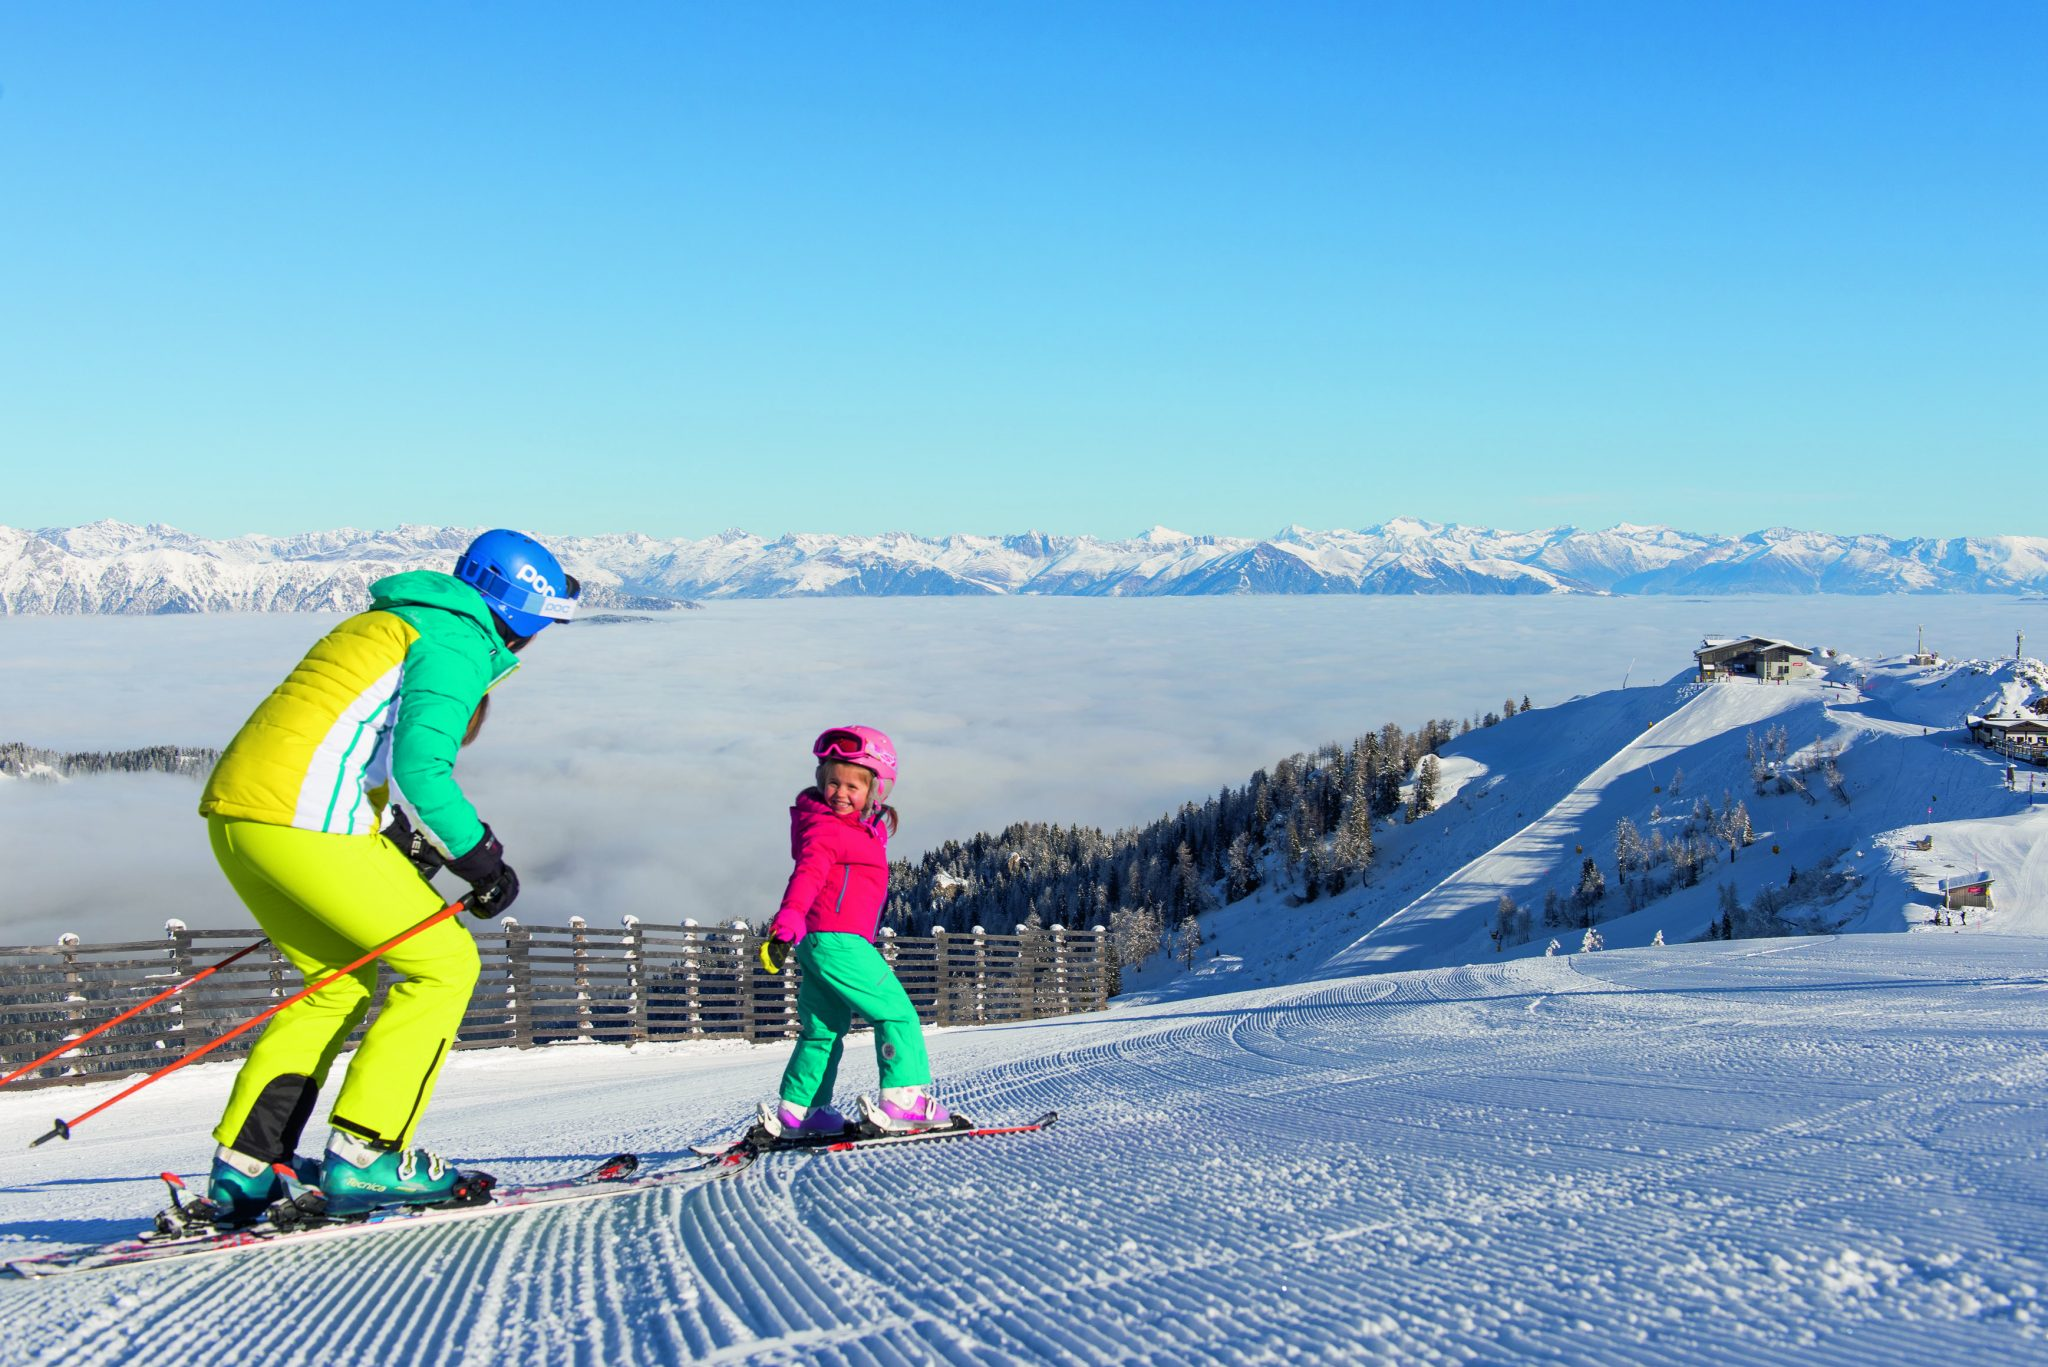 FranzGERDL_Kärnten Werbung_NASSFELD Ski Alpin _0238_087-17